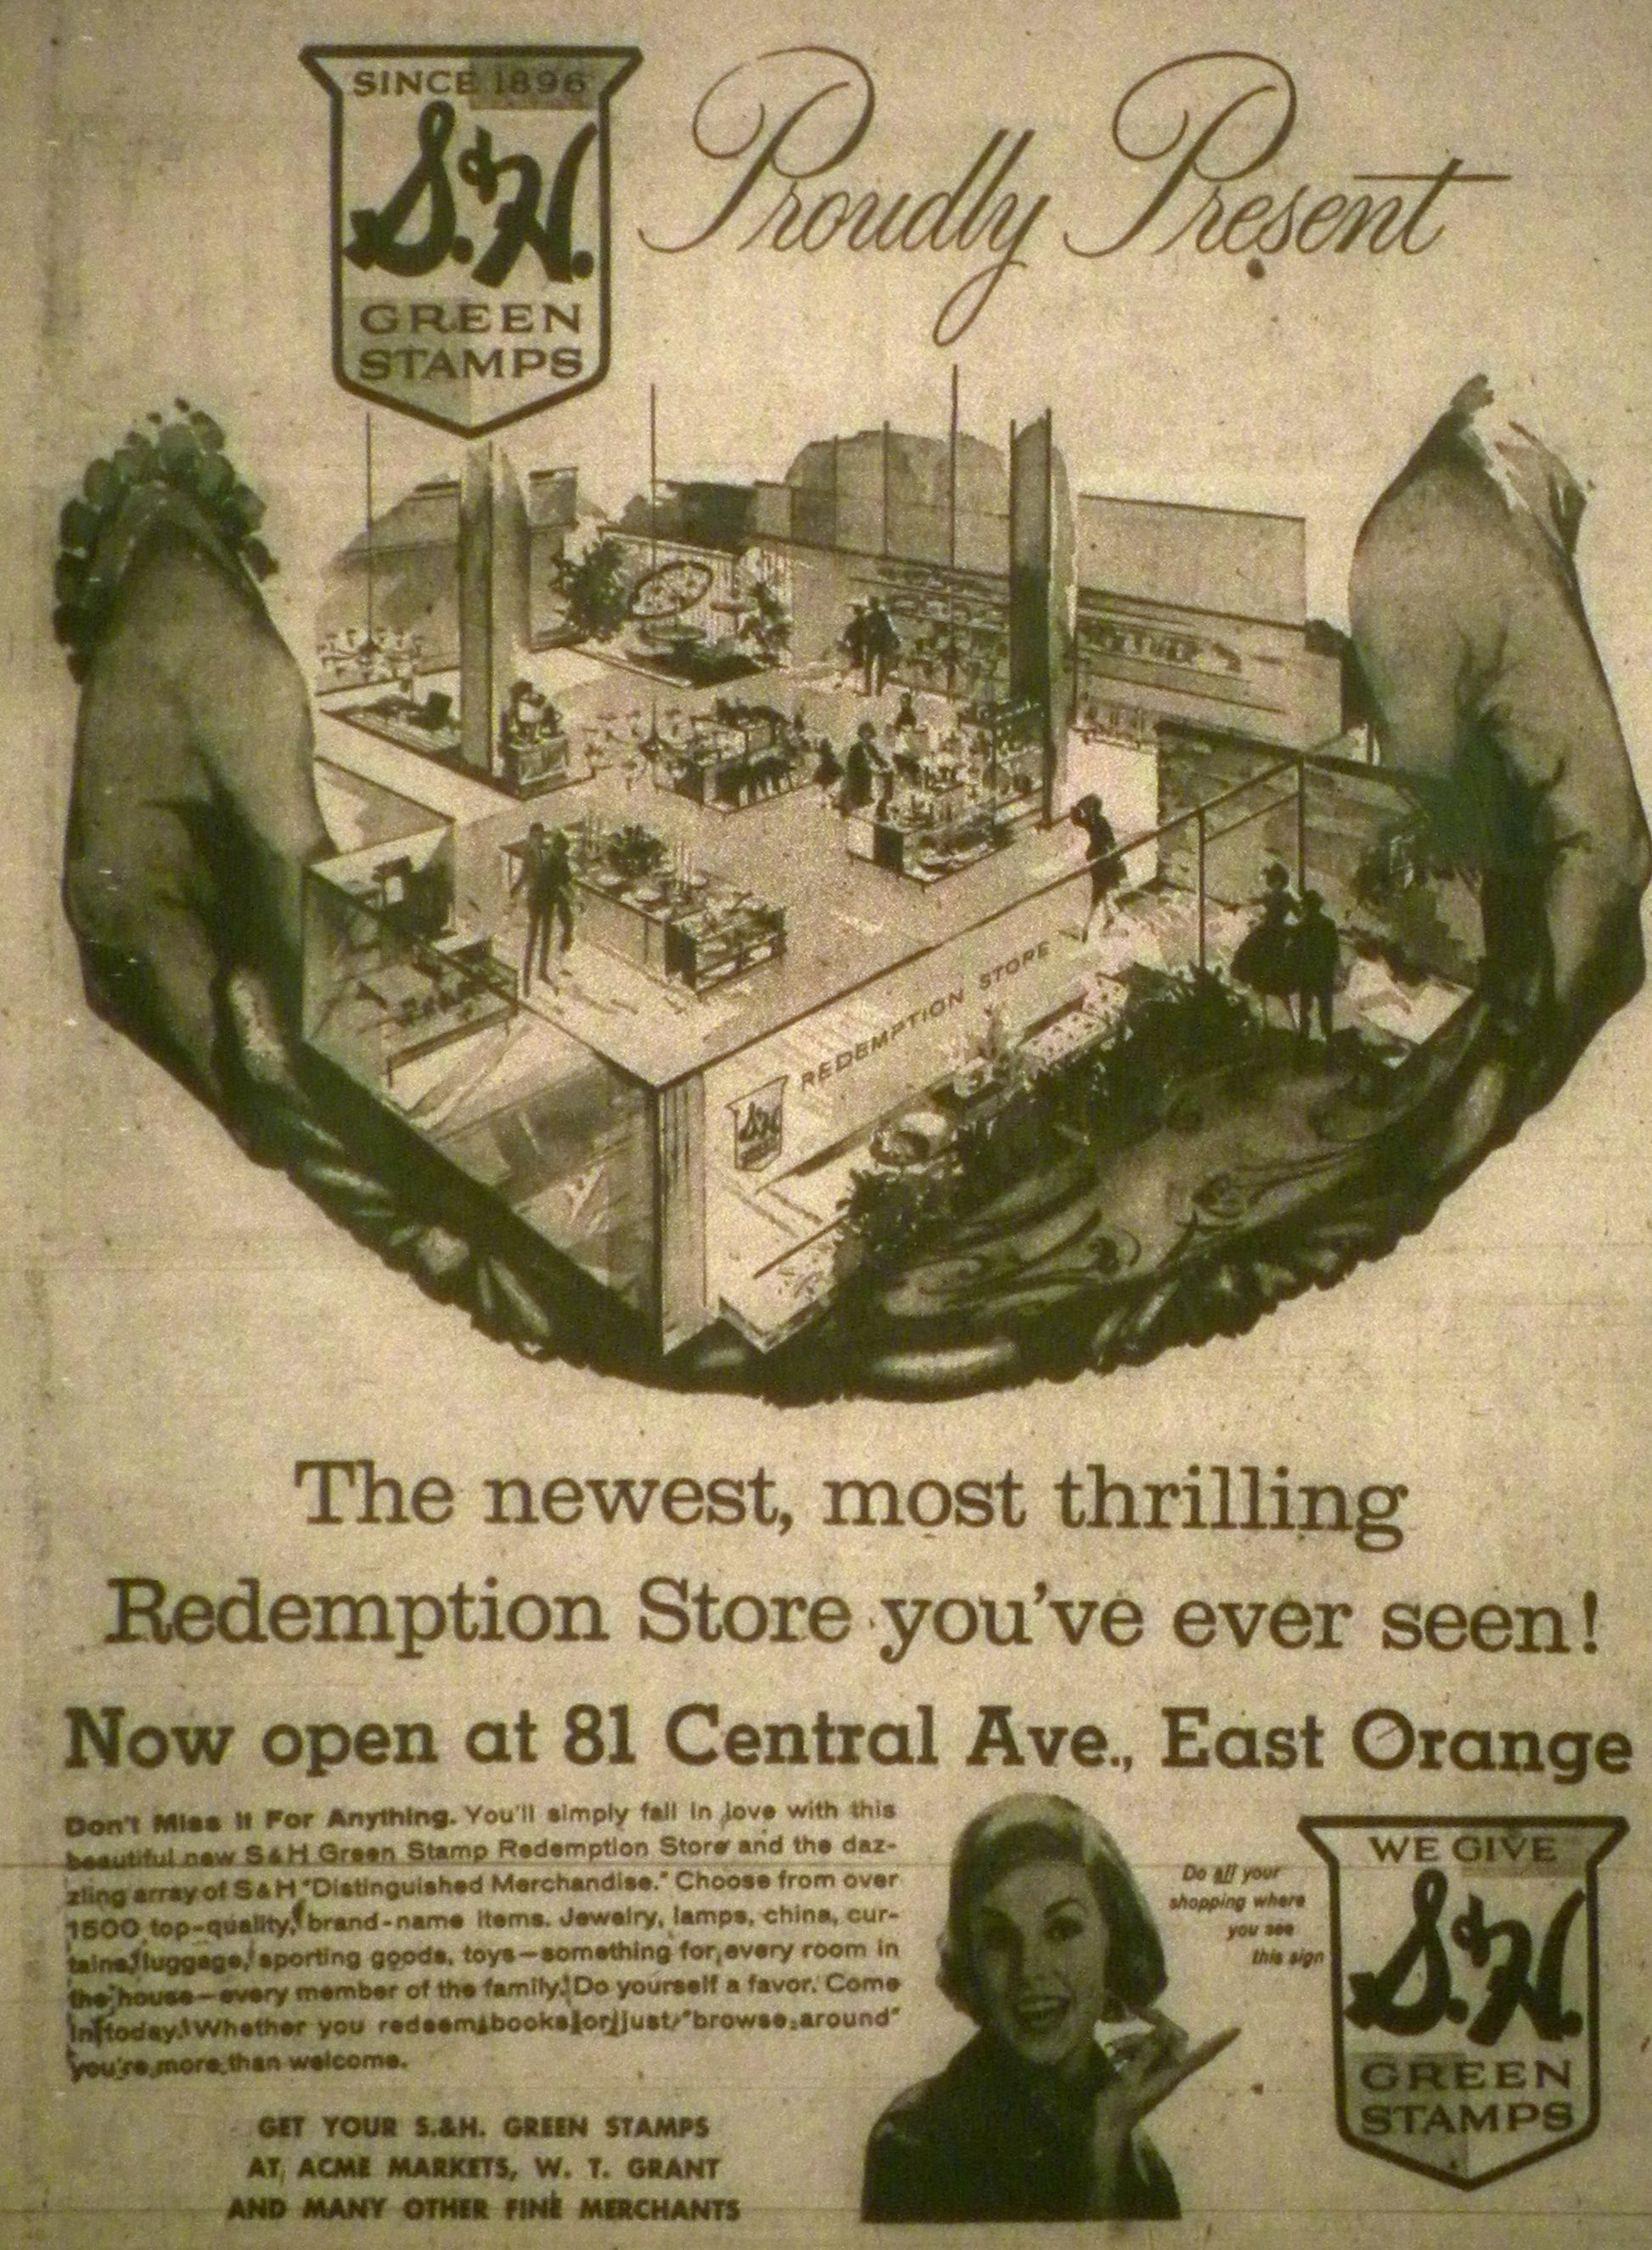 S H Greenstamp Redemption Center In East Orange East Orange Orange Rare Photos